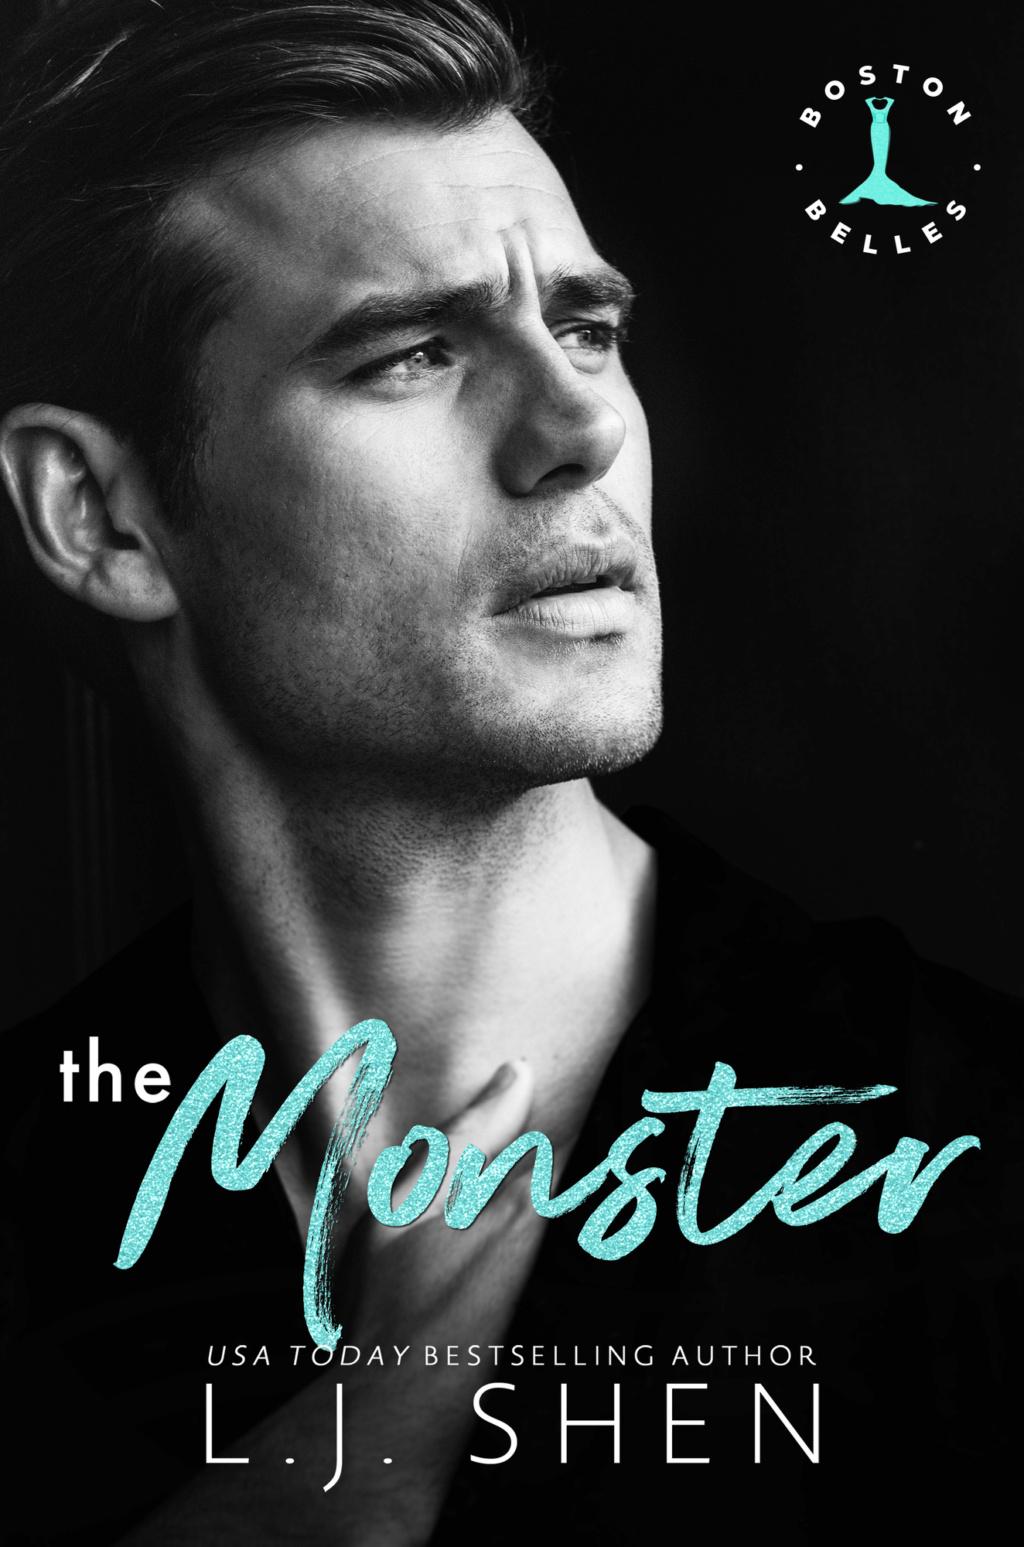 SHEN L J - BOSTON BELLES - TOME 3 : The Monster Ljsthe11